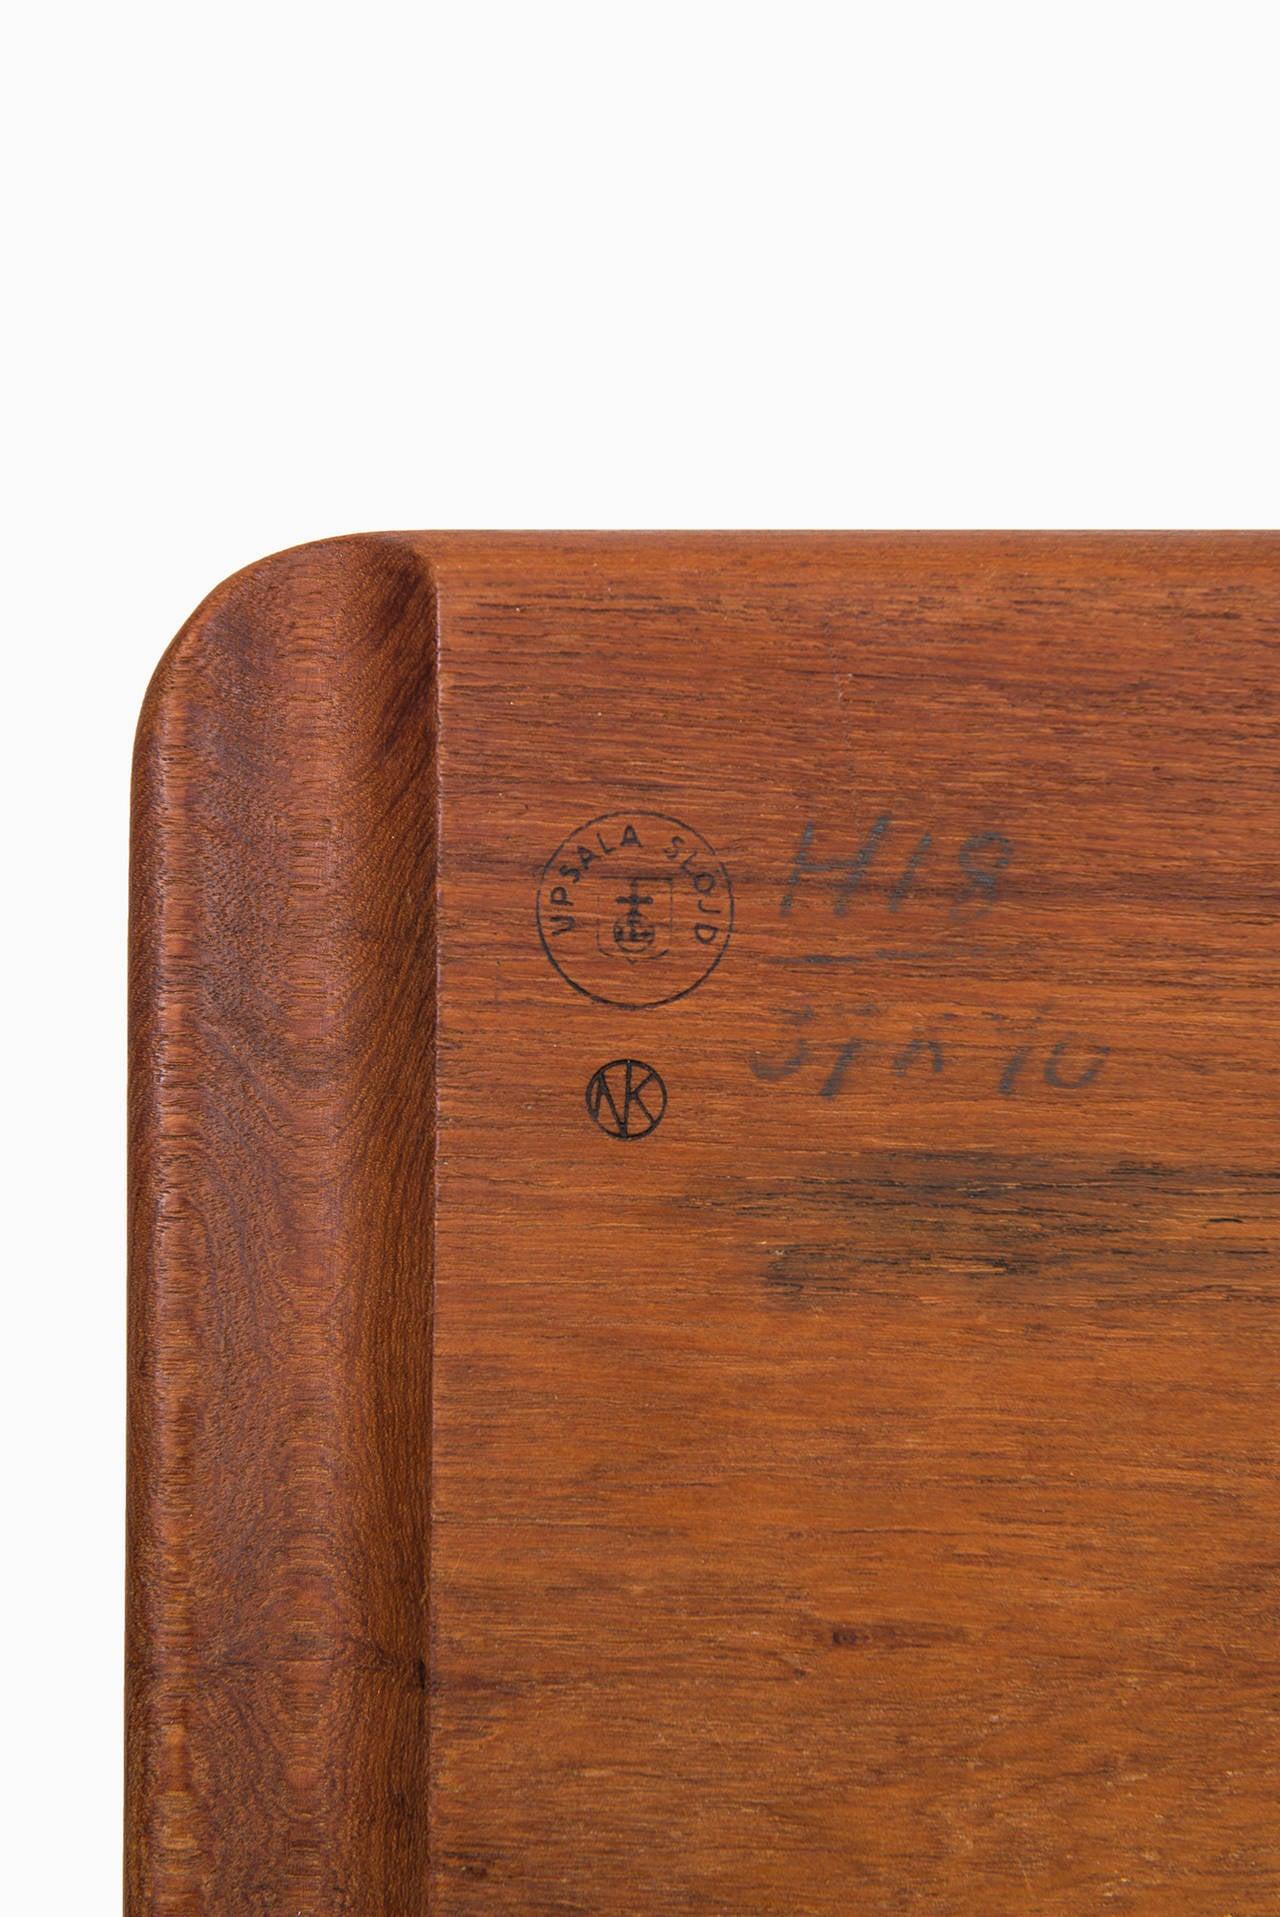 Mid Century 1950/'s Teak Johnny Mattsson For Upsala Slojd Wood Serving Tray Made In Sweden